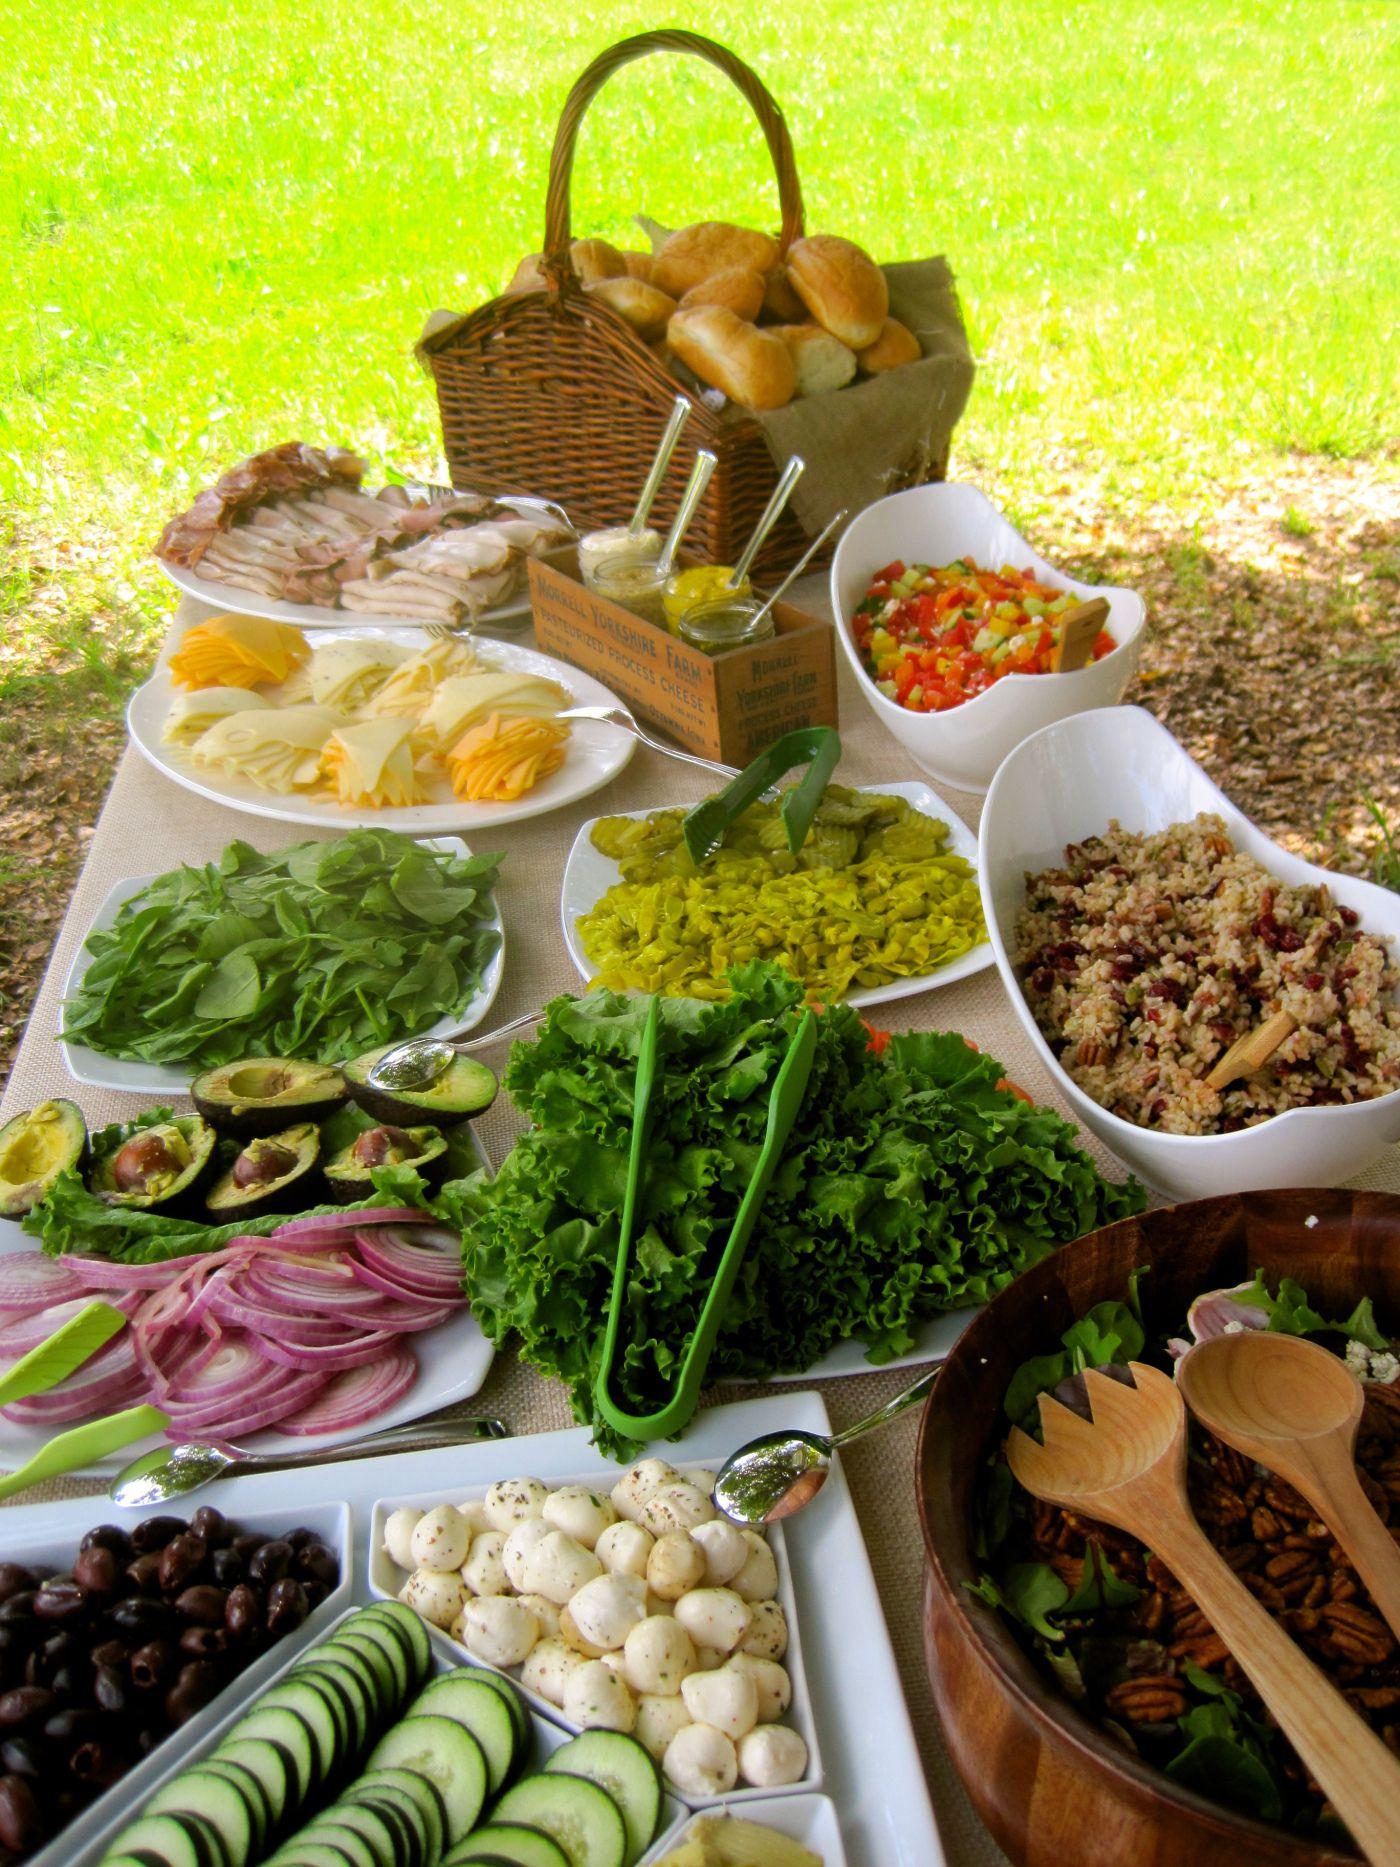 Submarine Sandwich Bar   Elegant & Appetizing  White or ...  Salad Bar Luncheon Ideas